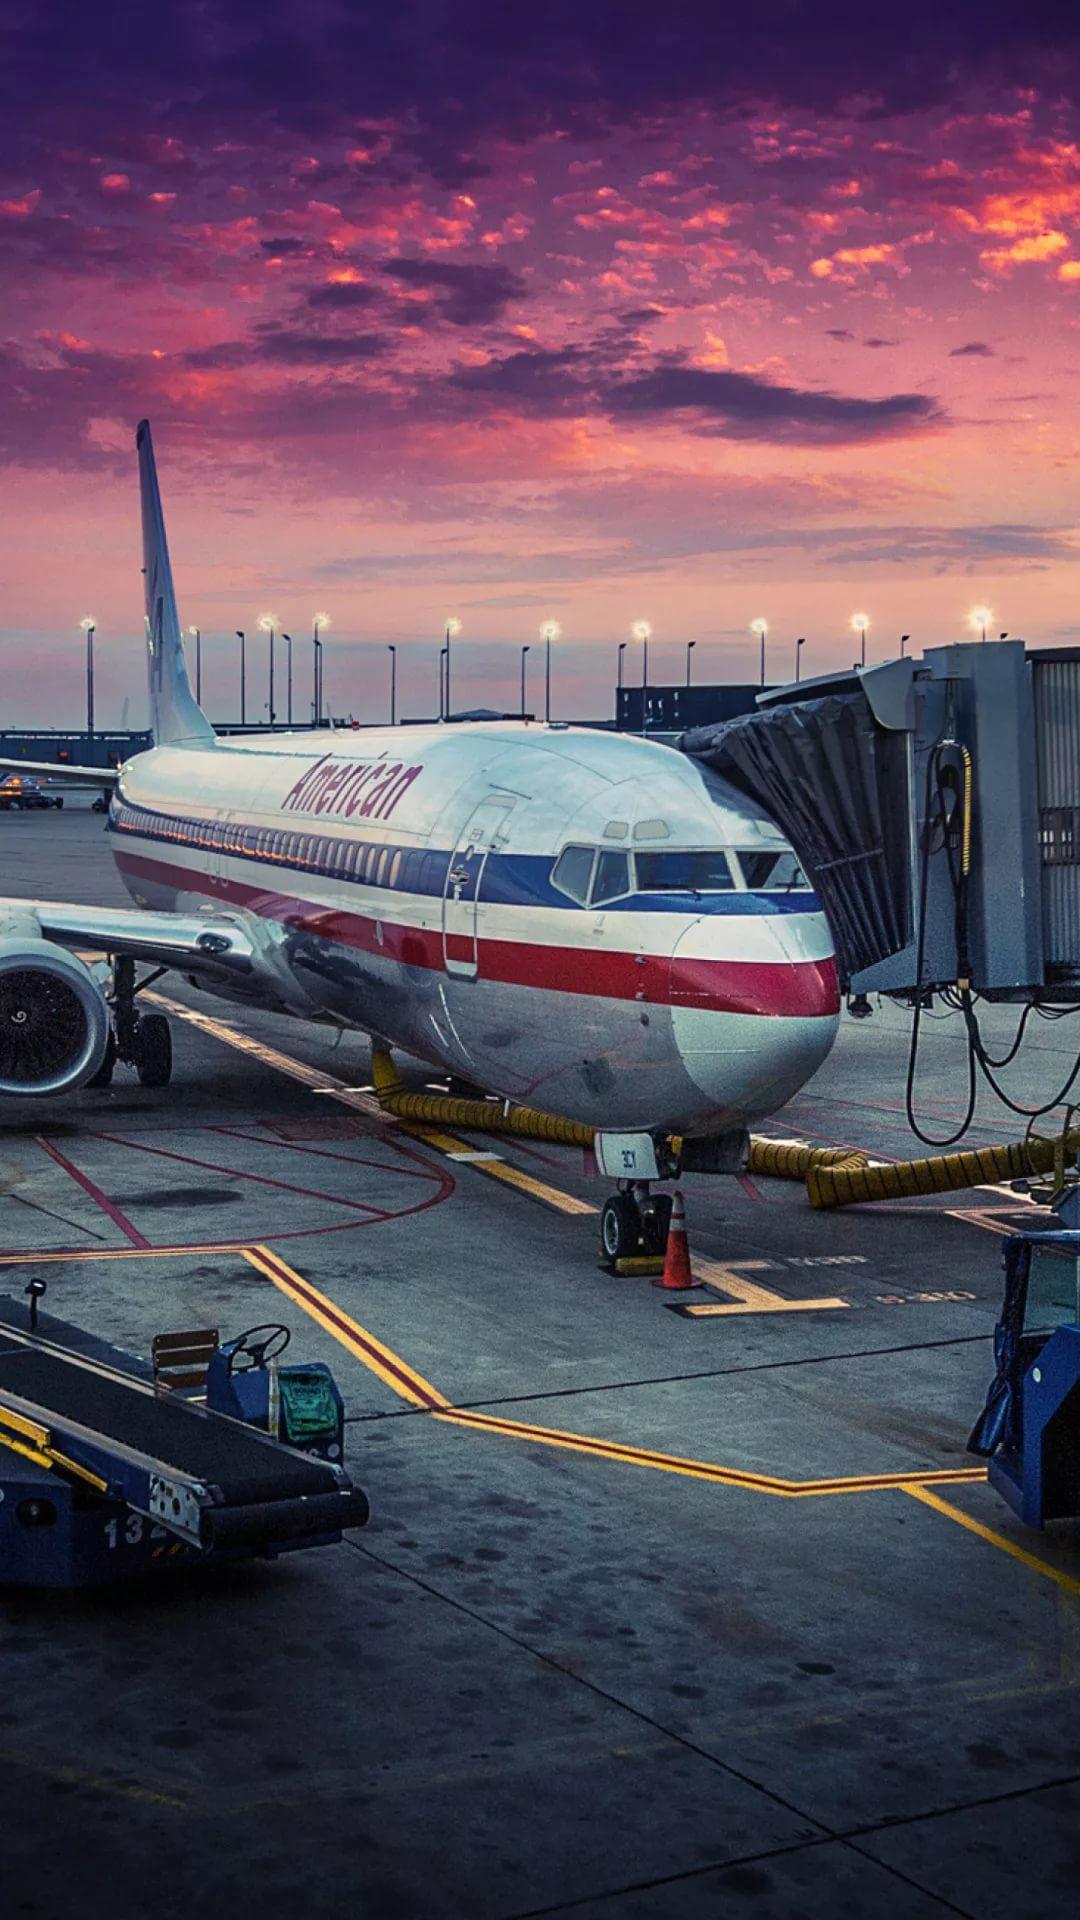 Airplane iPhone x wallpaper hd